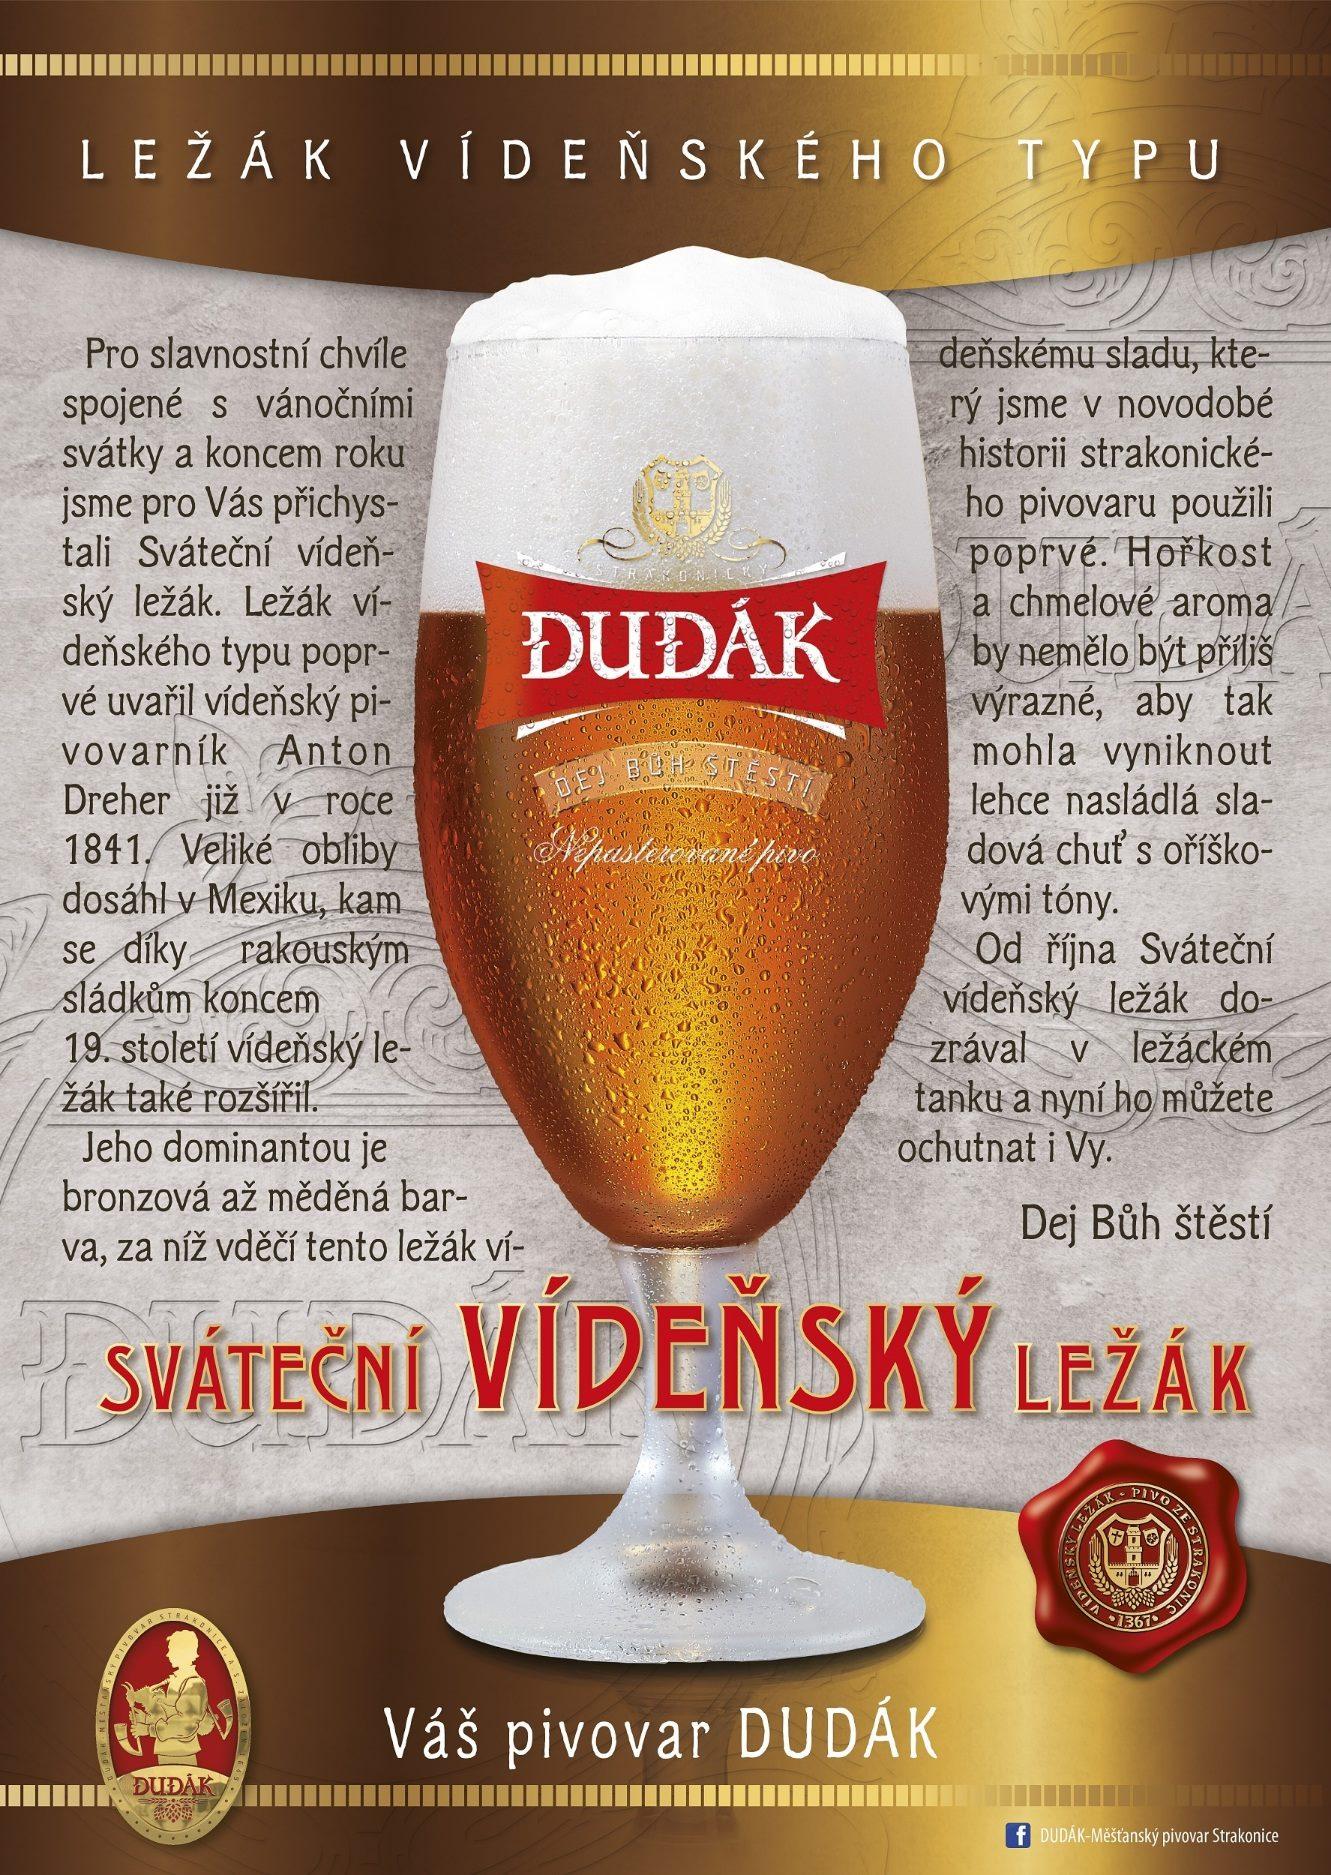 pivovari-pivovary-vidensky-vanocni-special-pivovar-dudak